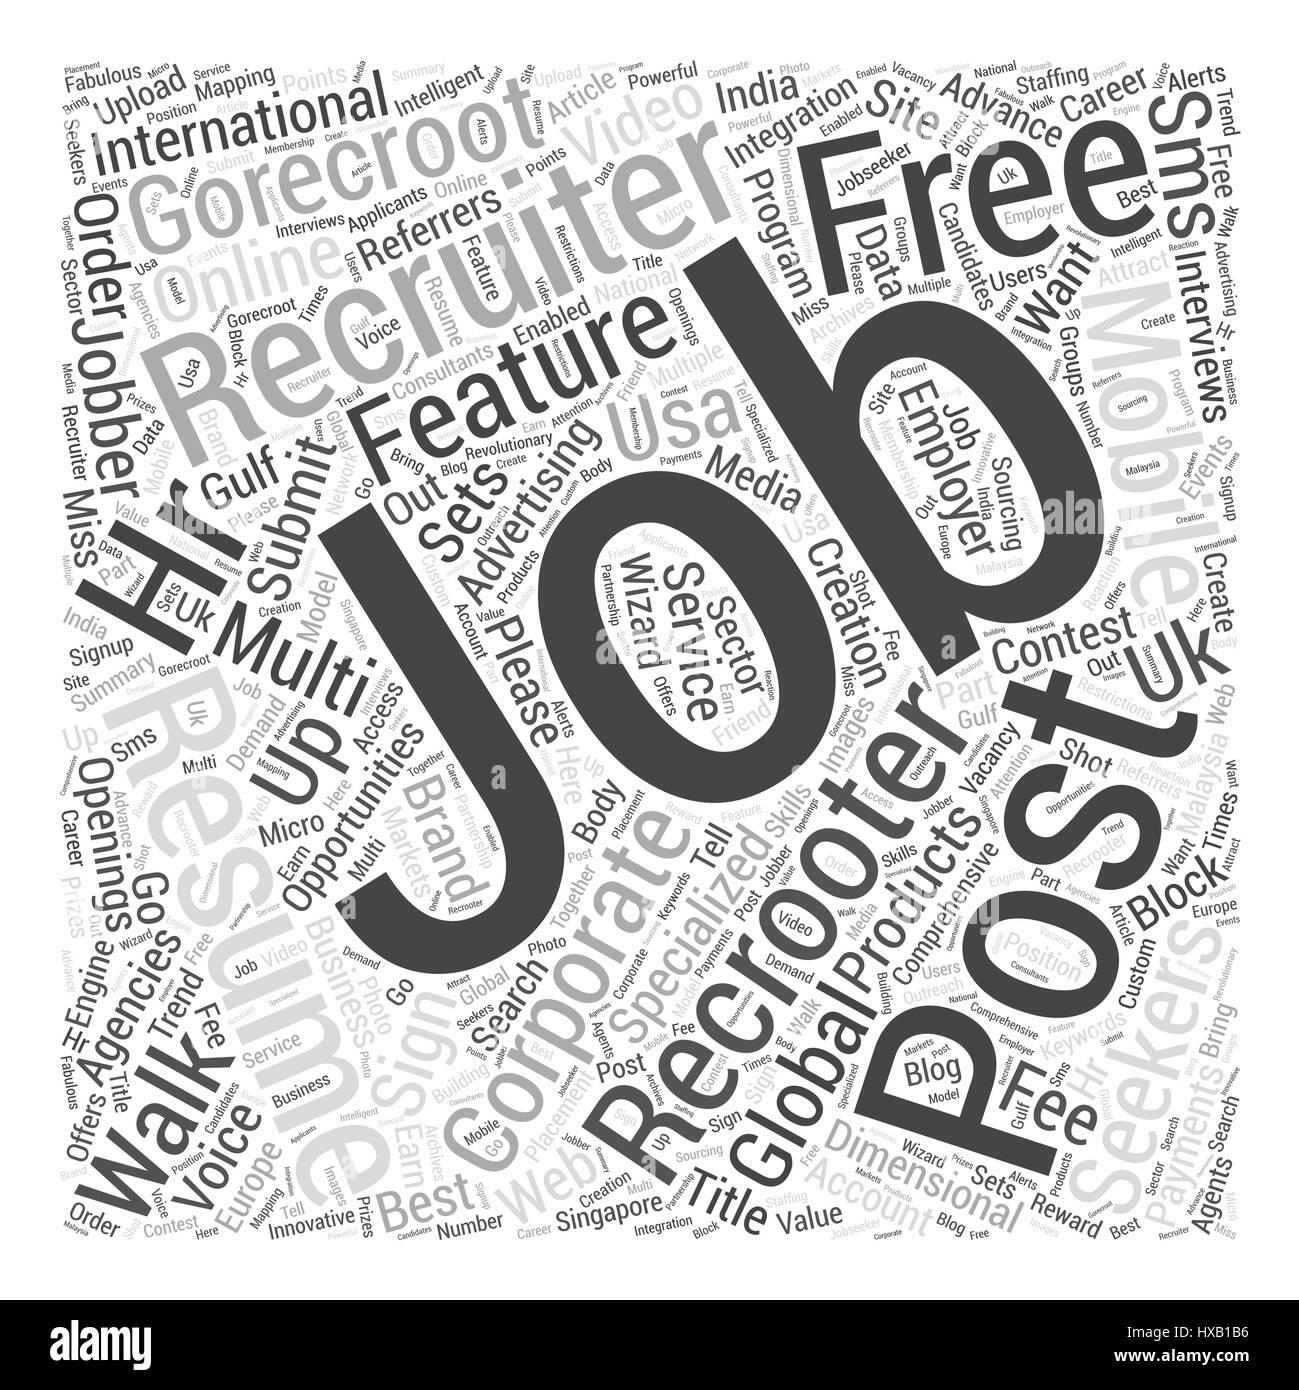 GoRecroot International Jobs Recruiters Post Free Job